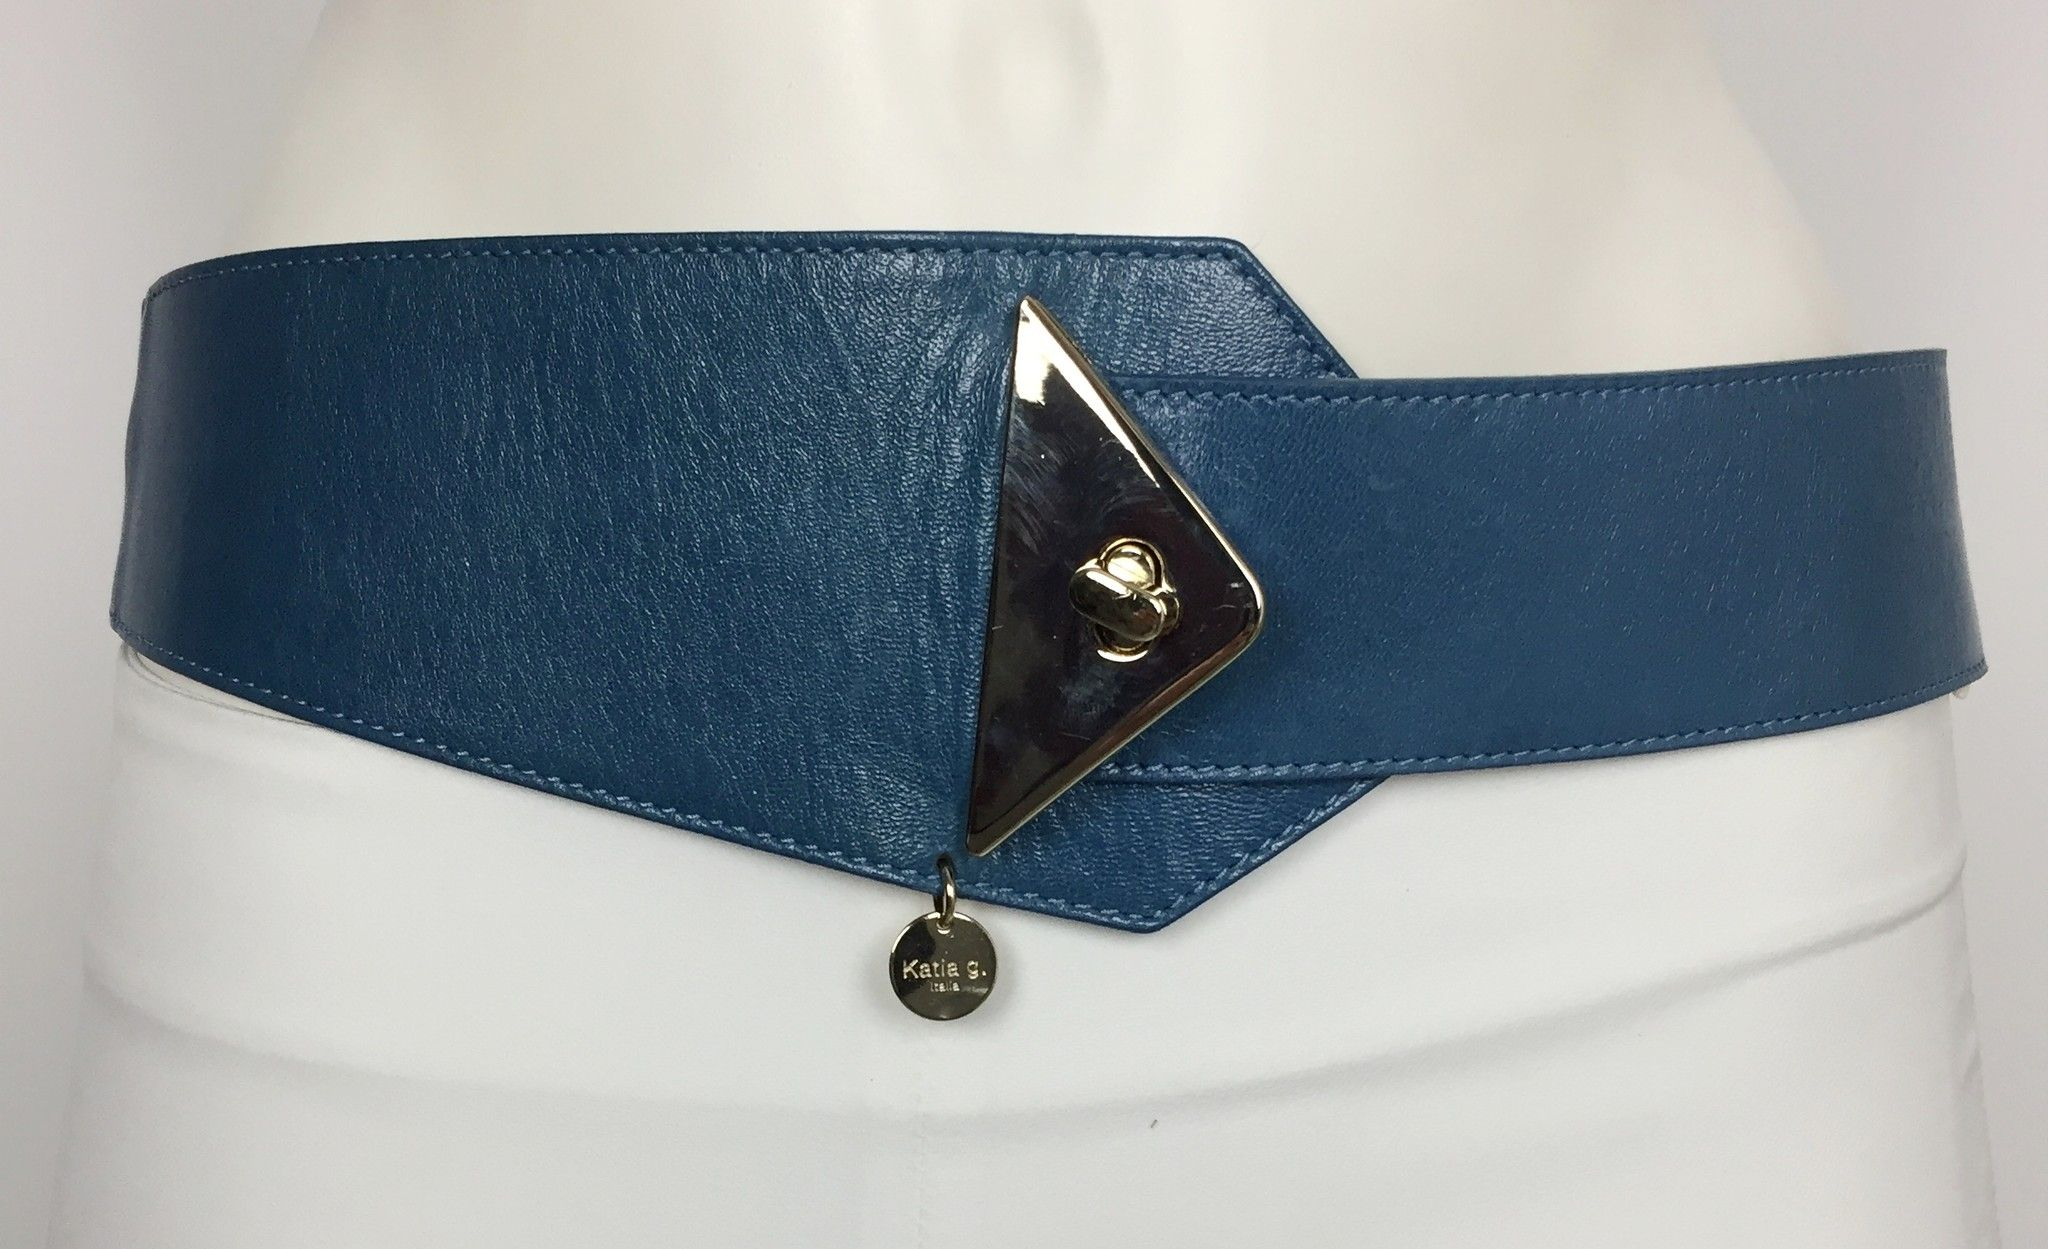 Cintura Katia G. Alta Elastica Dietro con Fibbia Dorata Cod.354862